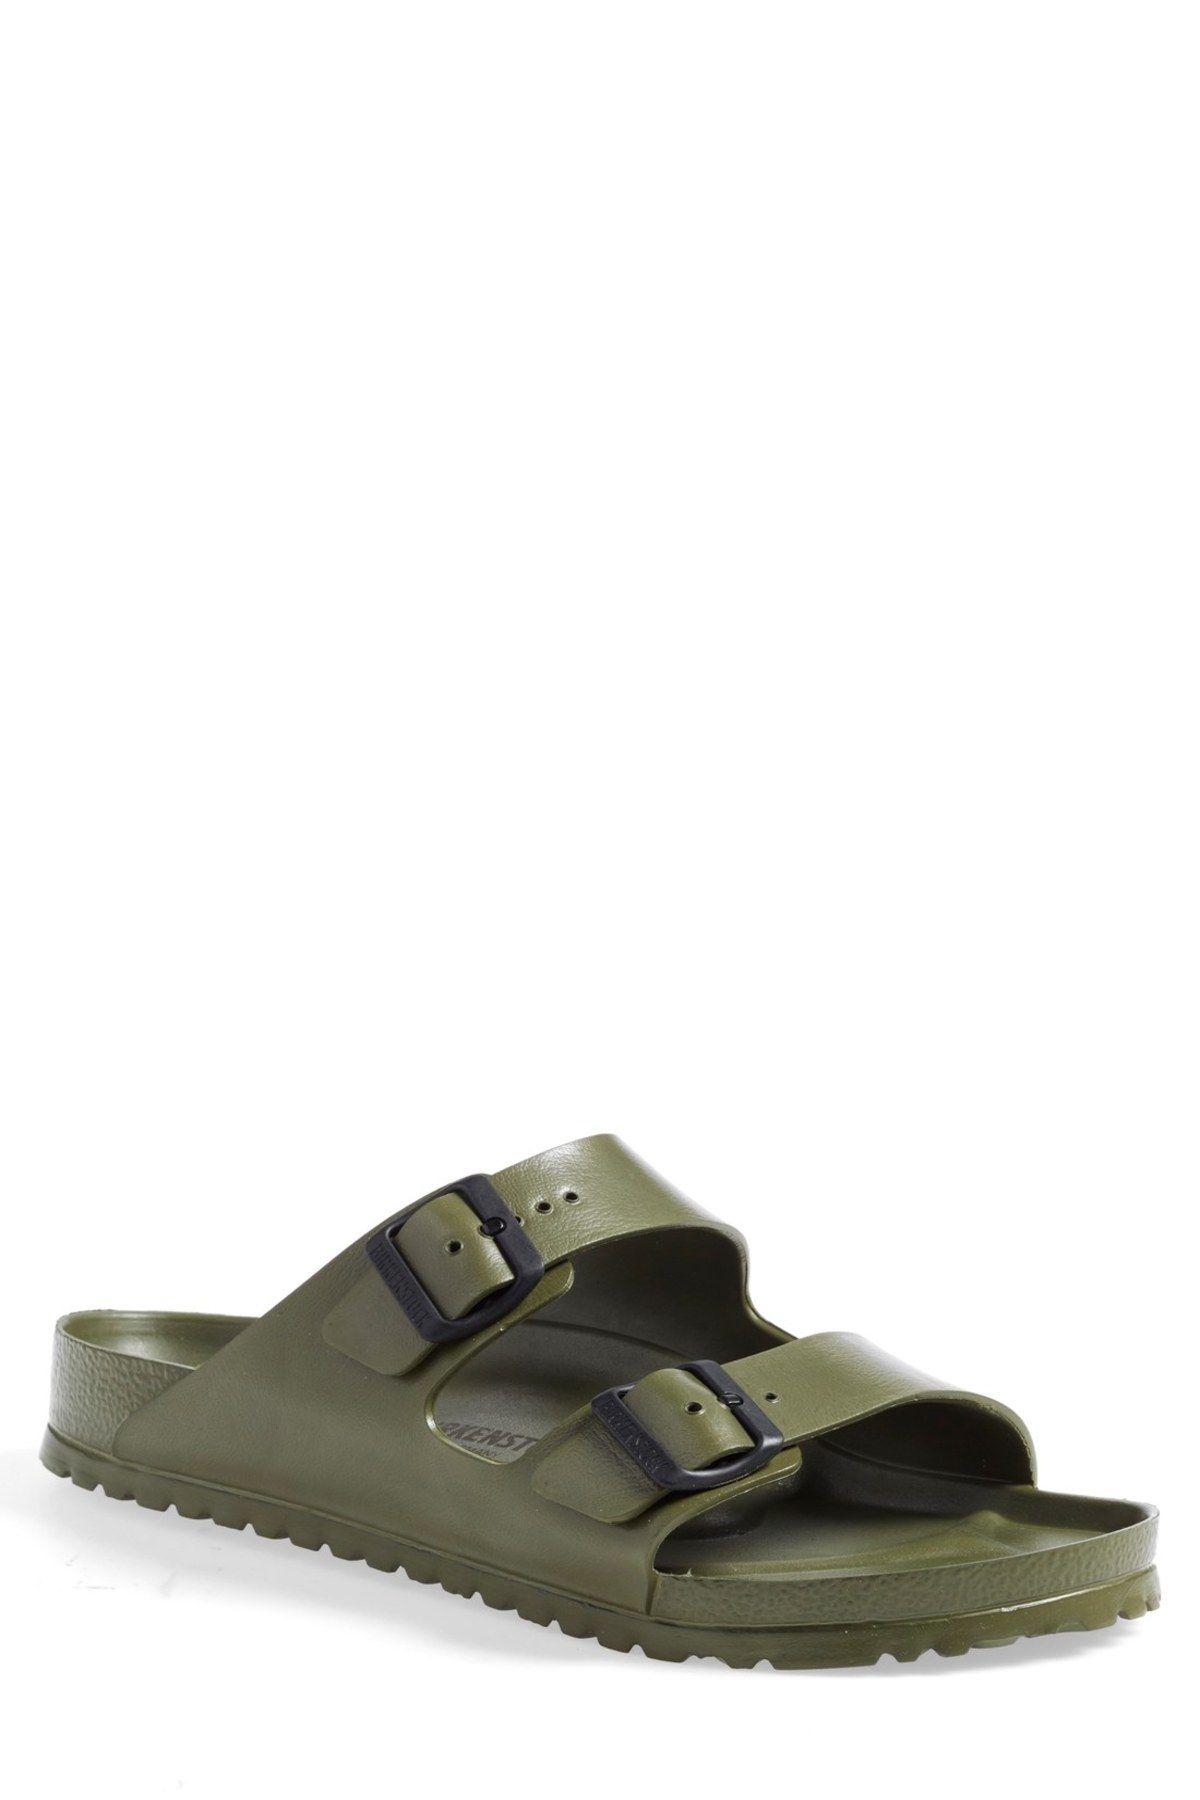 9c15e6ad3434 Essentials Arizona EVA Waterproof Slide Sandal - Discontinued